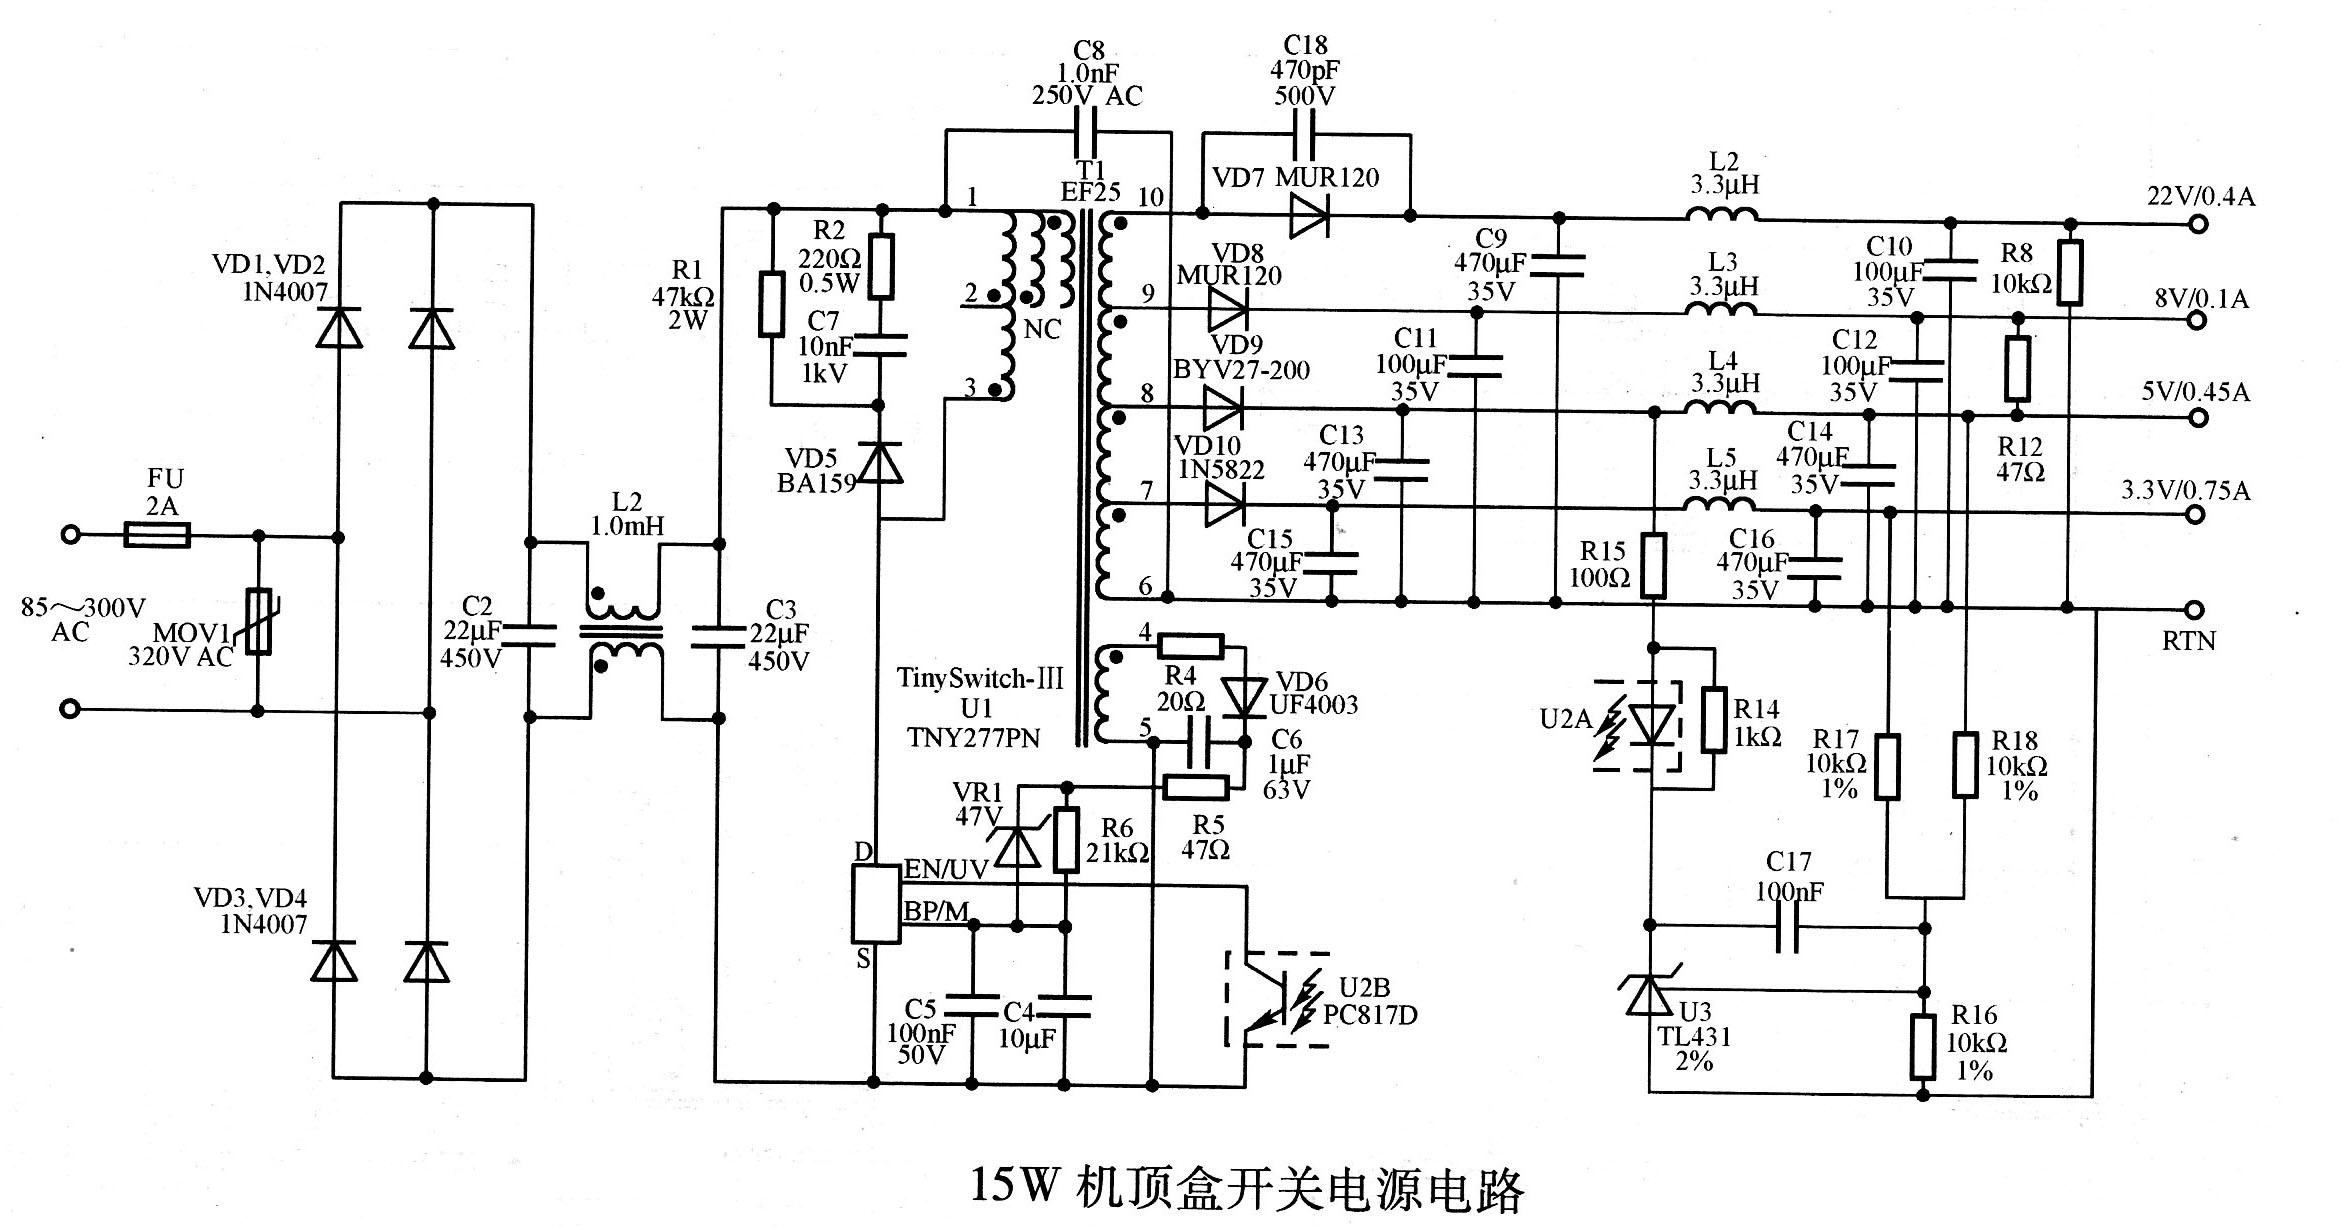 15W机顶盒开关电源电路